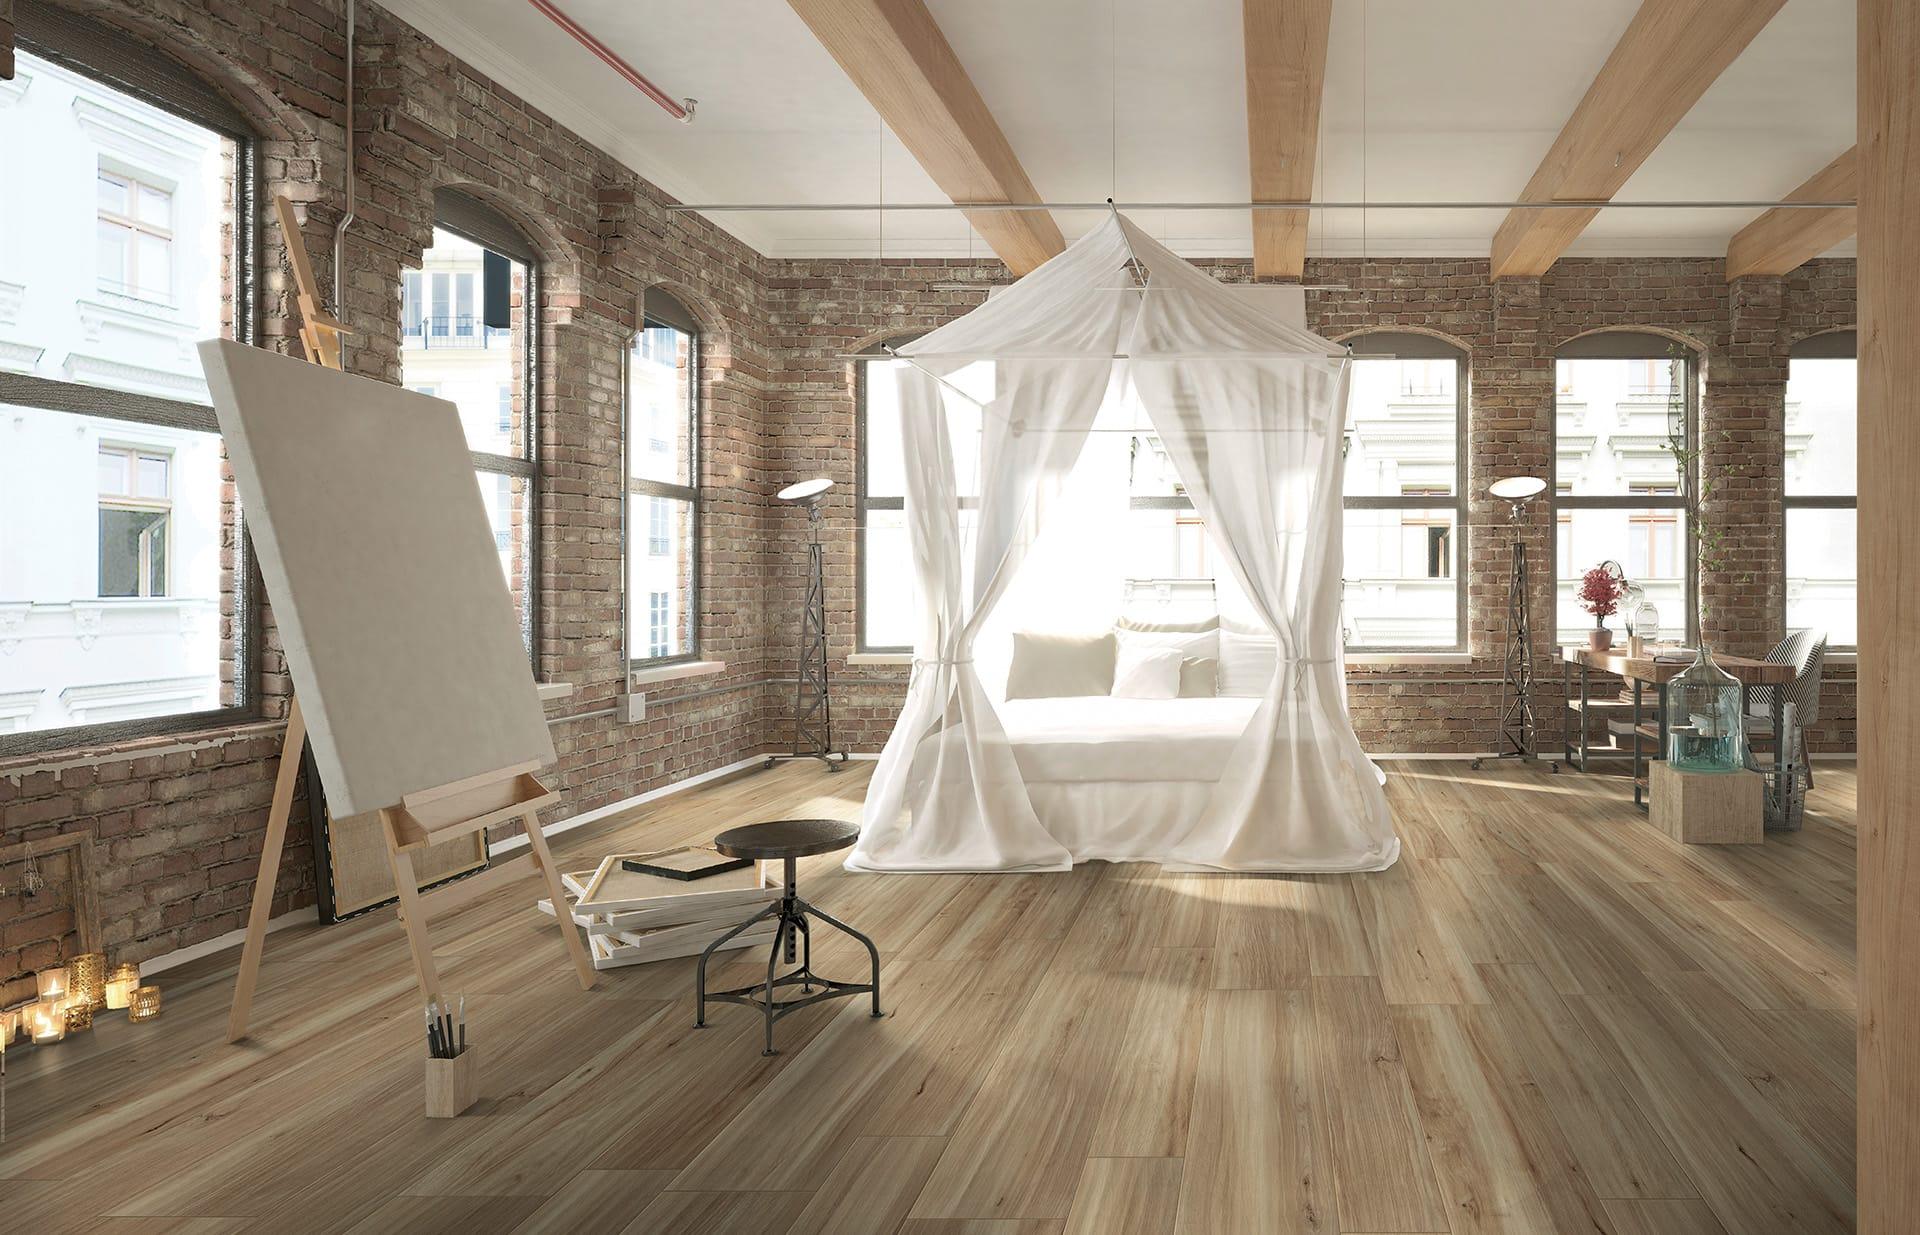 Wood Flooring Osborne Park Images - Cheap Laminate Wood Flooring